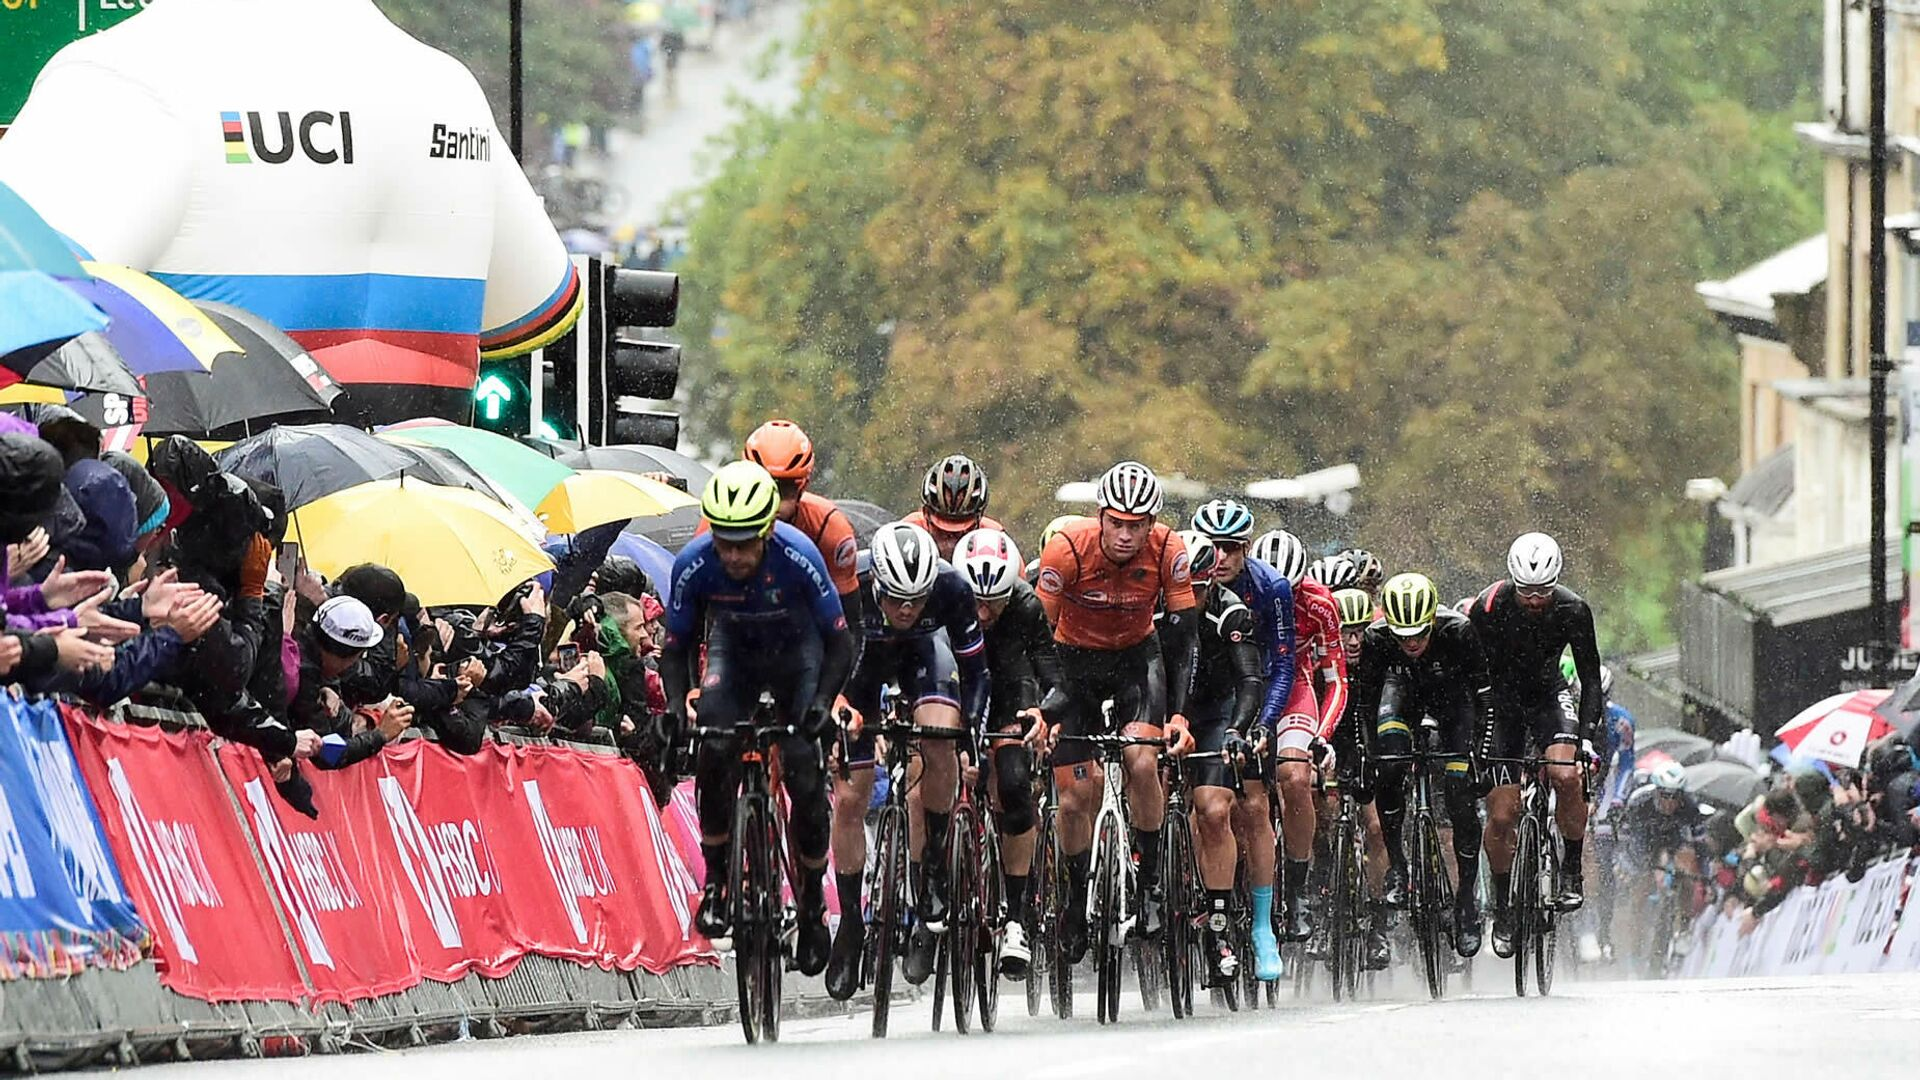 Гонка на чемпионате мира по велоспорту на шоссе  - РИА Новости, 1920, 17.01.2021